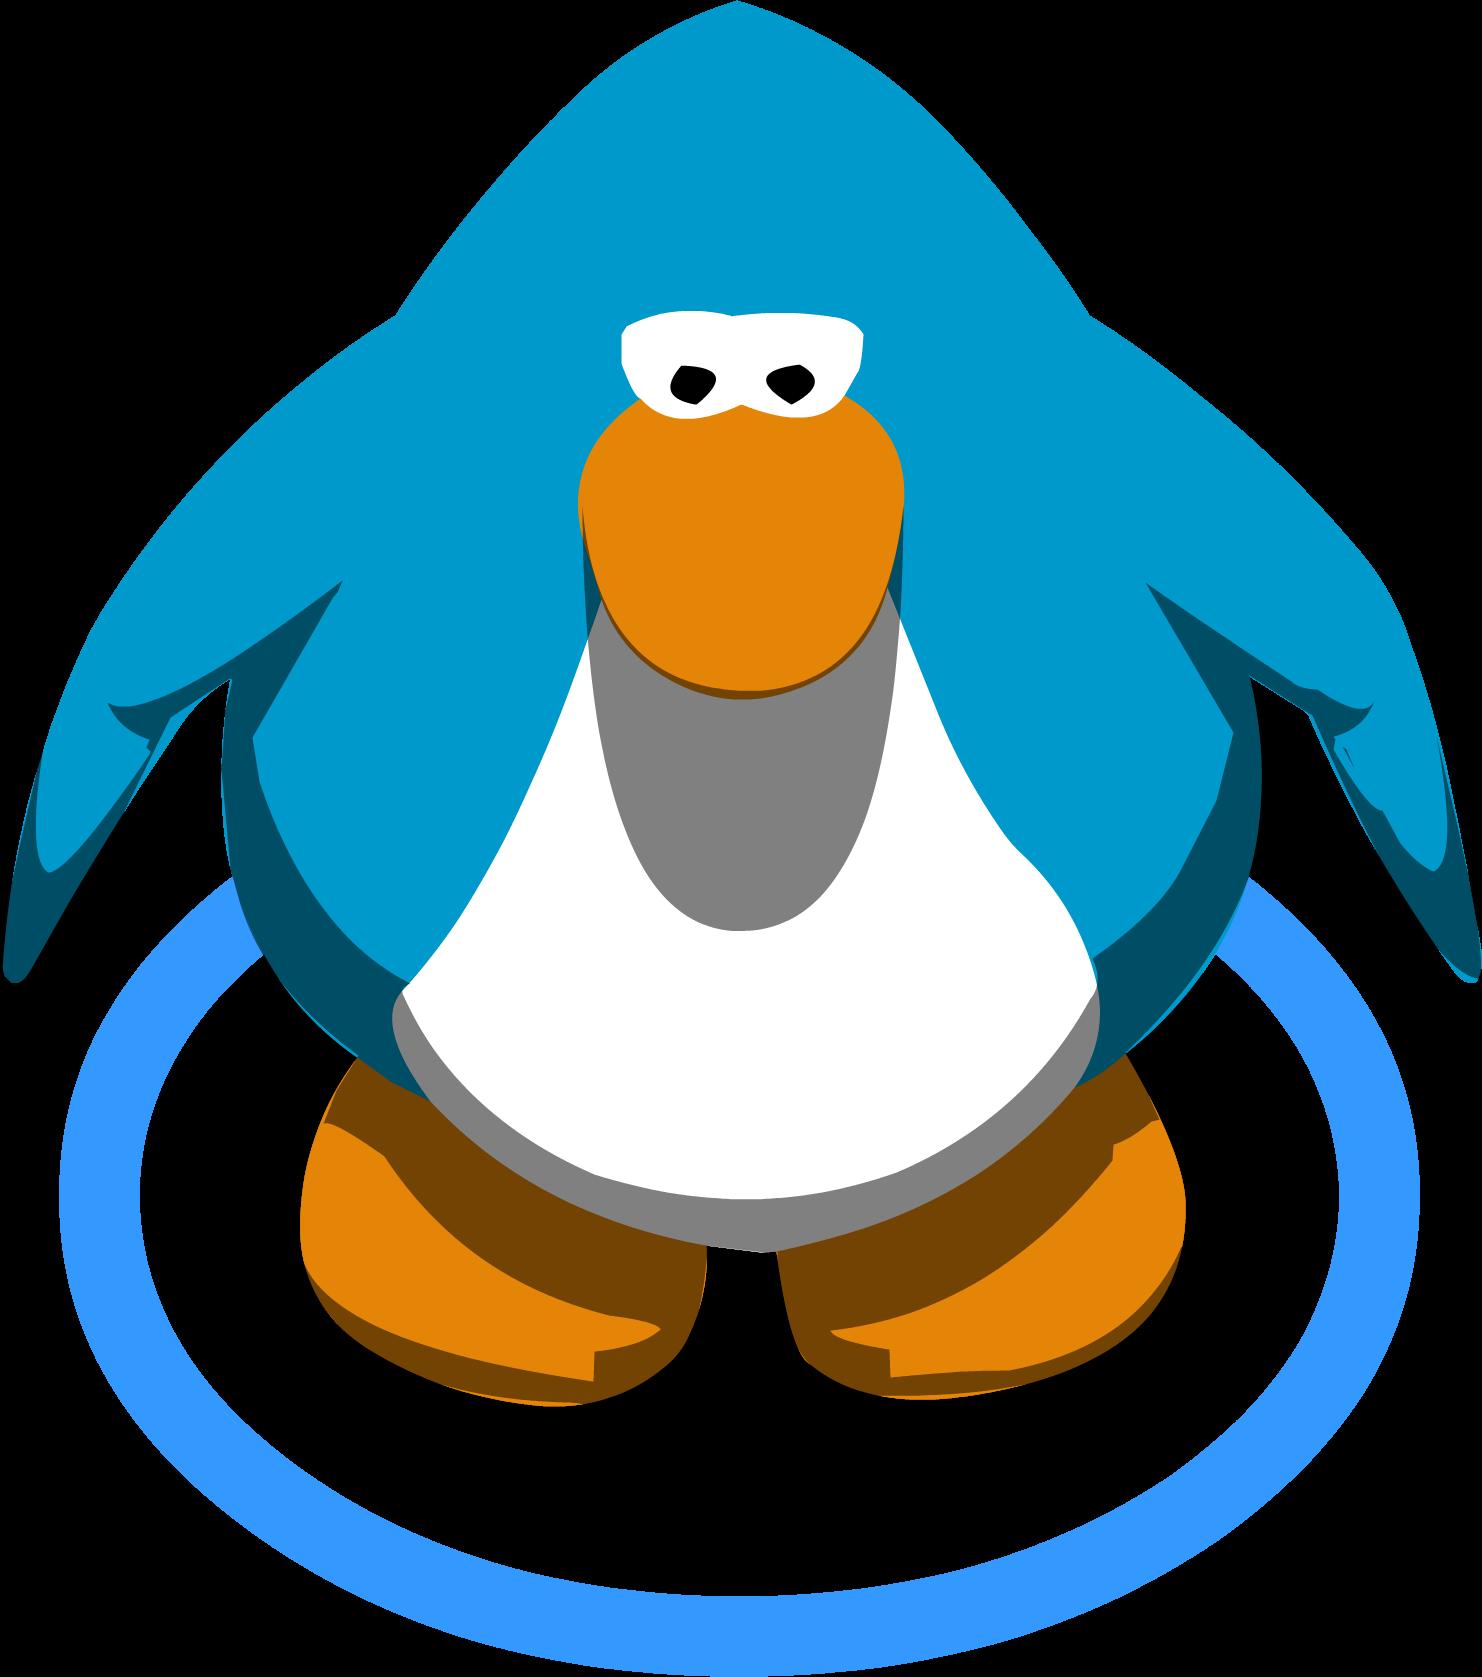 Club Penguin Penguins Google Search Club Penguin Penguins Pluto The Dog